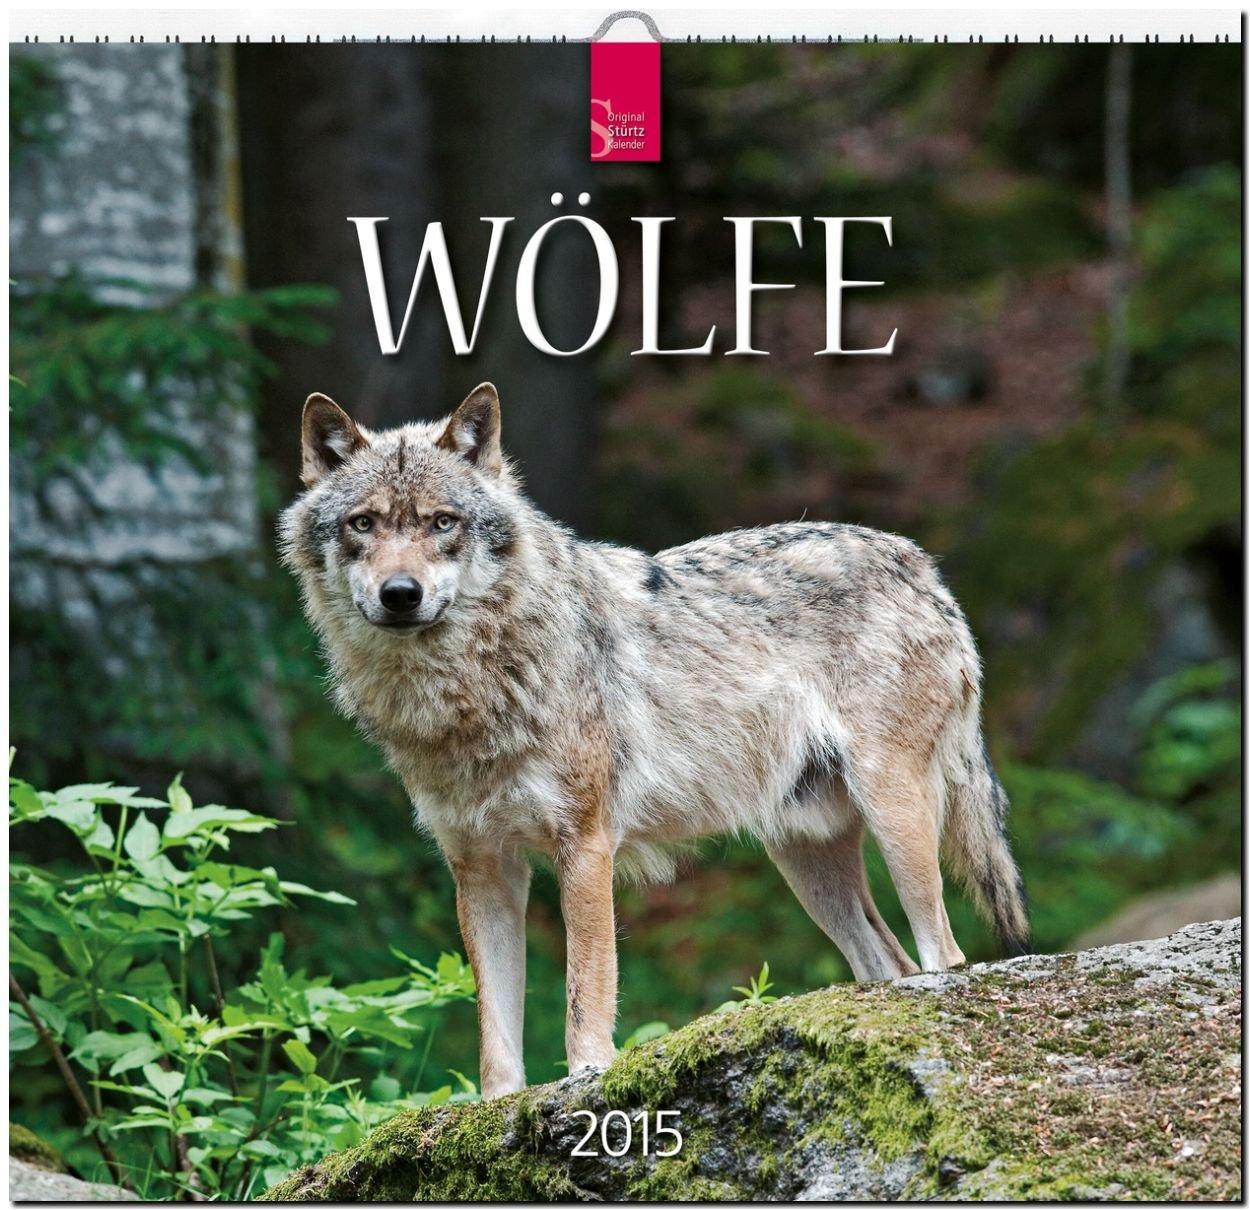 Wölfe 2015 - Original Stürtz-Kalender - Mittelformat-Kalender 33 x 31 cm